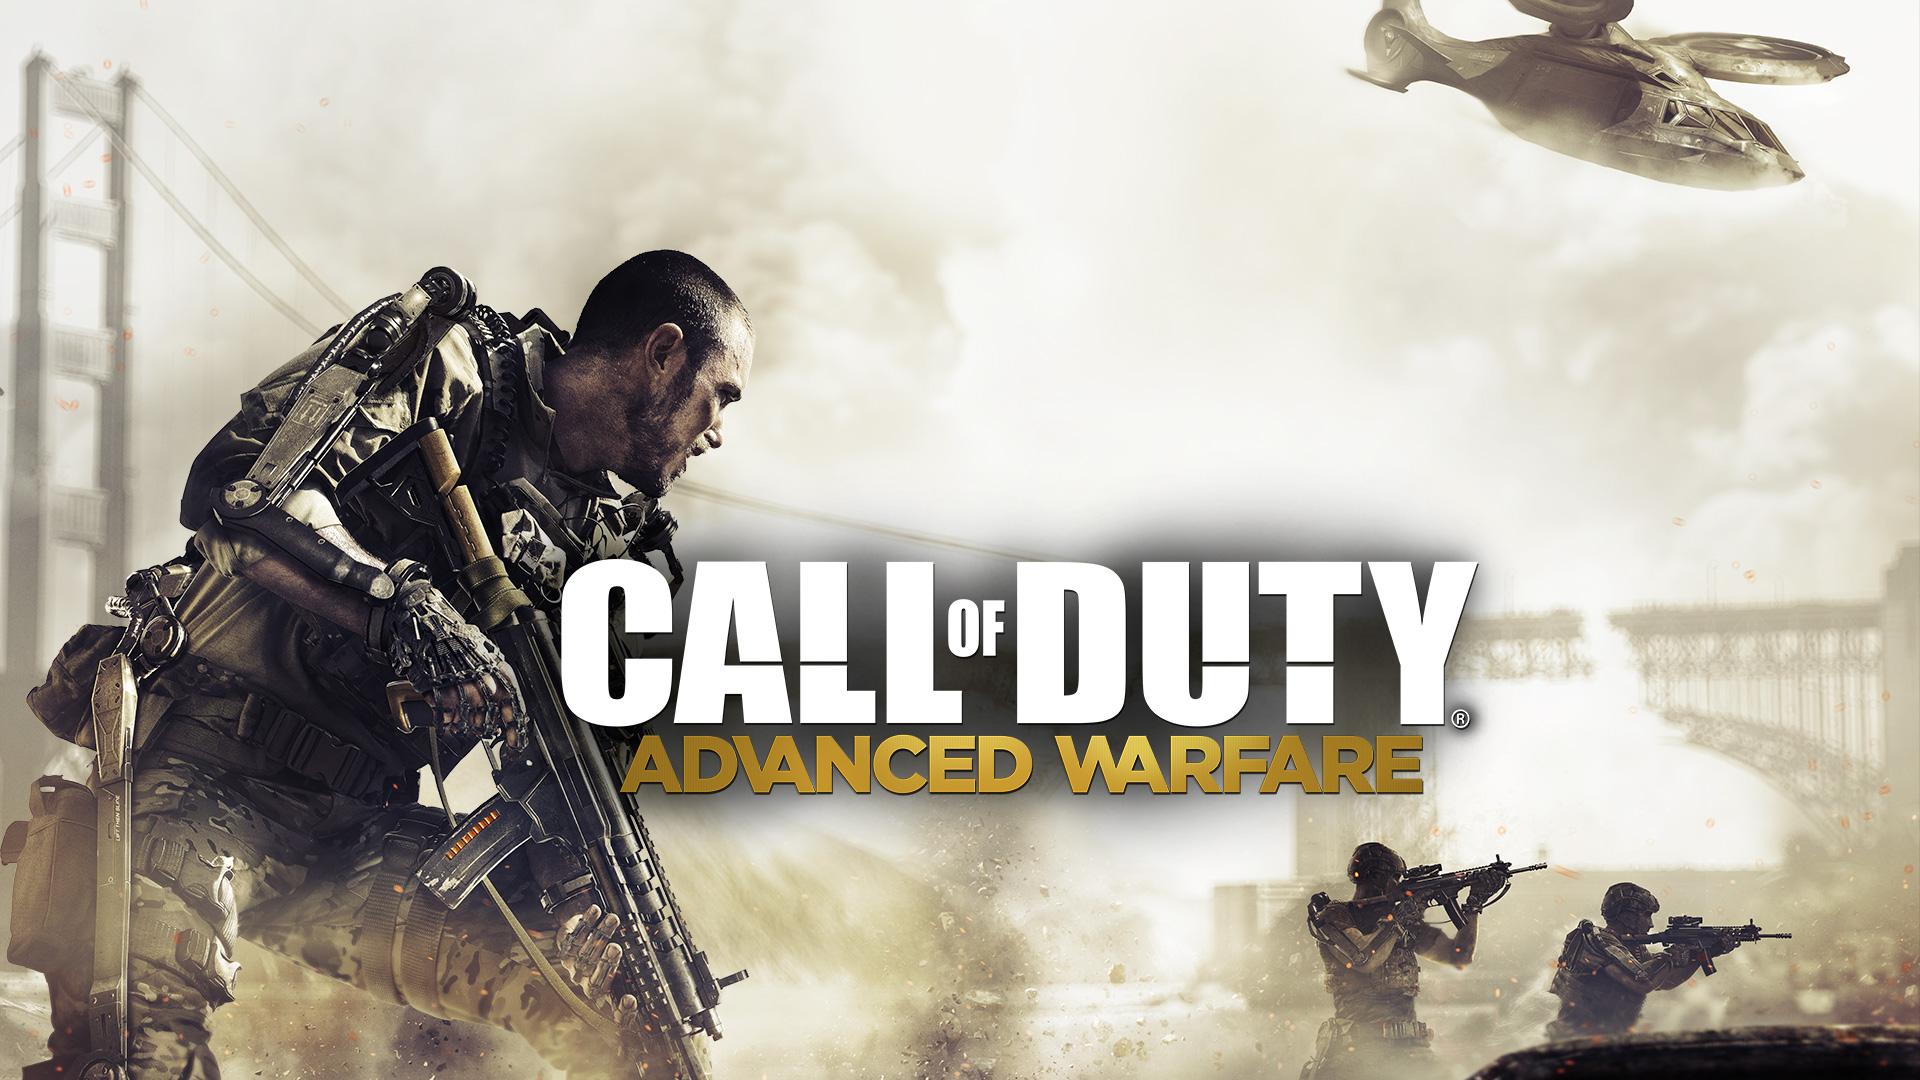 Call of Duty®: Advanced Warfare Game | PS4 - PlayStation Call Of Duty Advanced Warfare Map Packs on